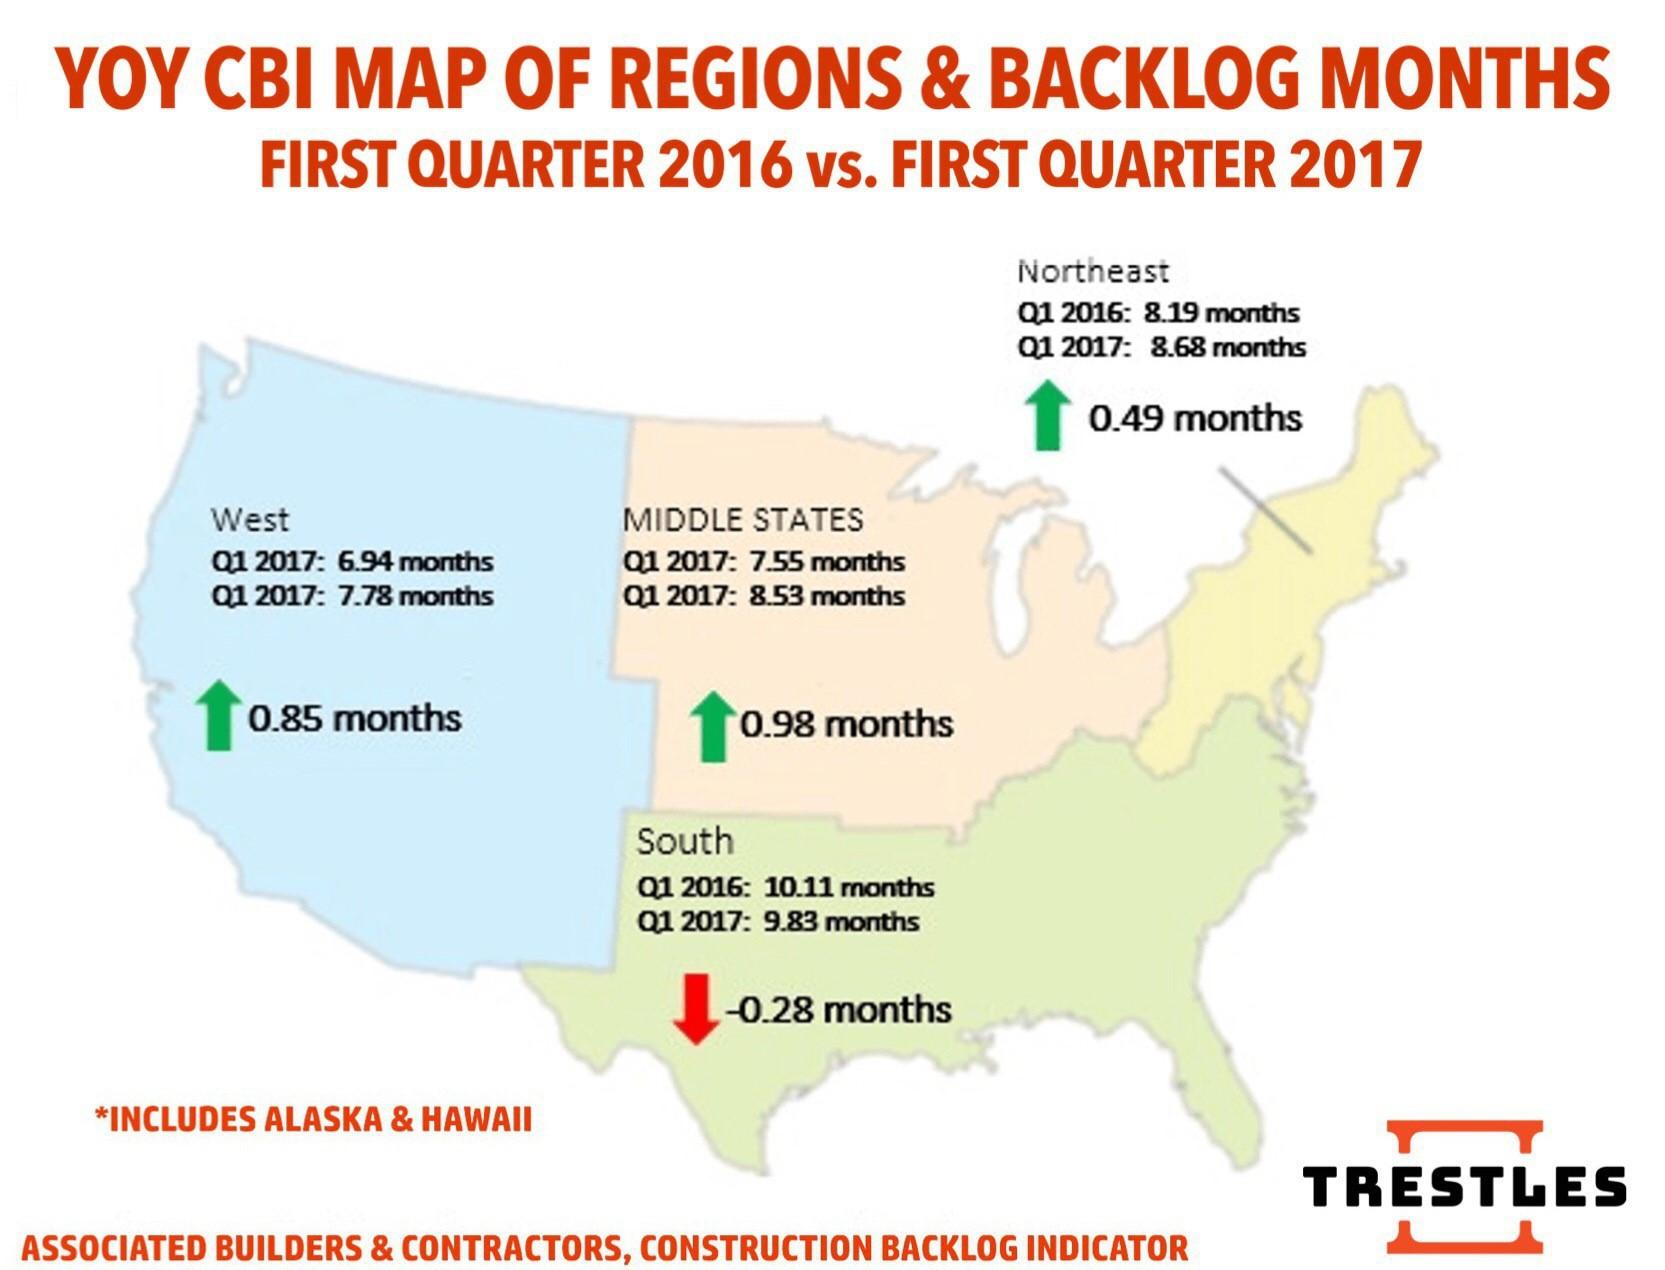 TRESTLES - Year Over Year CBI Map of Regions & Backlog Months